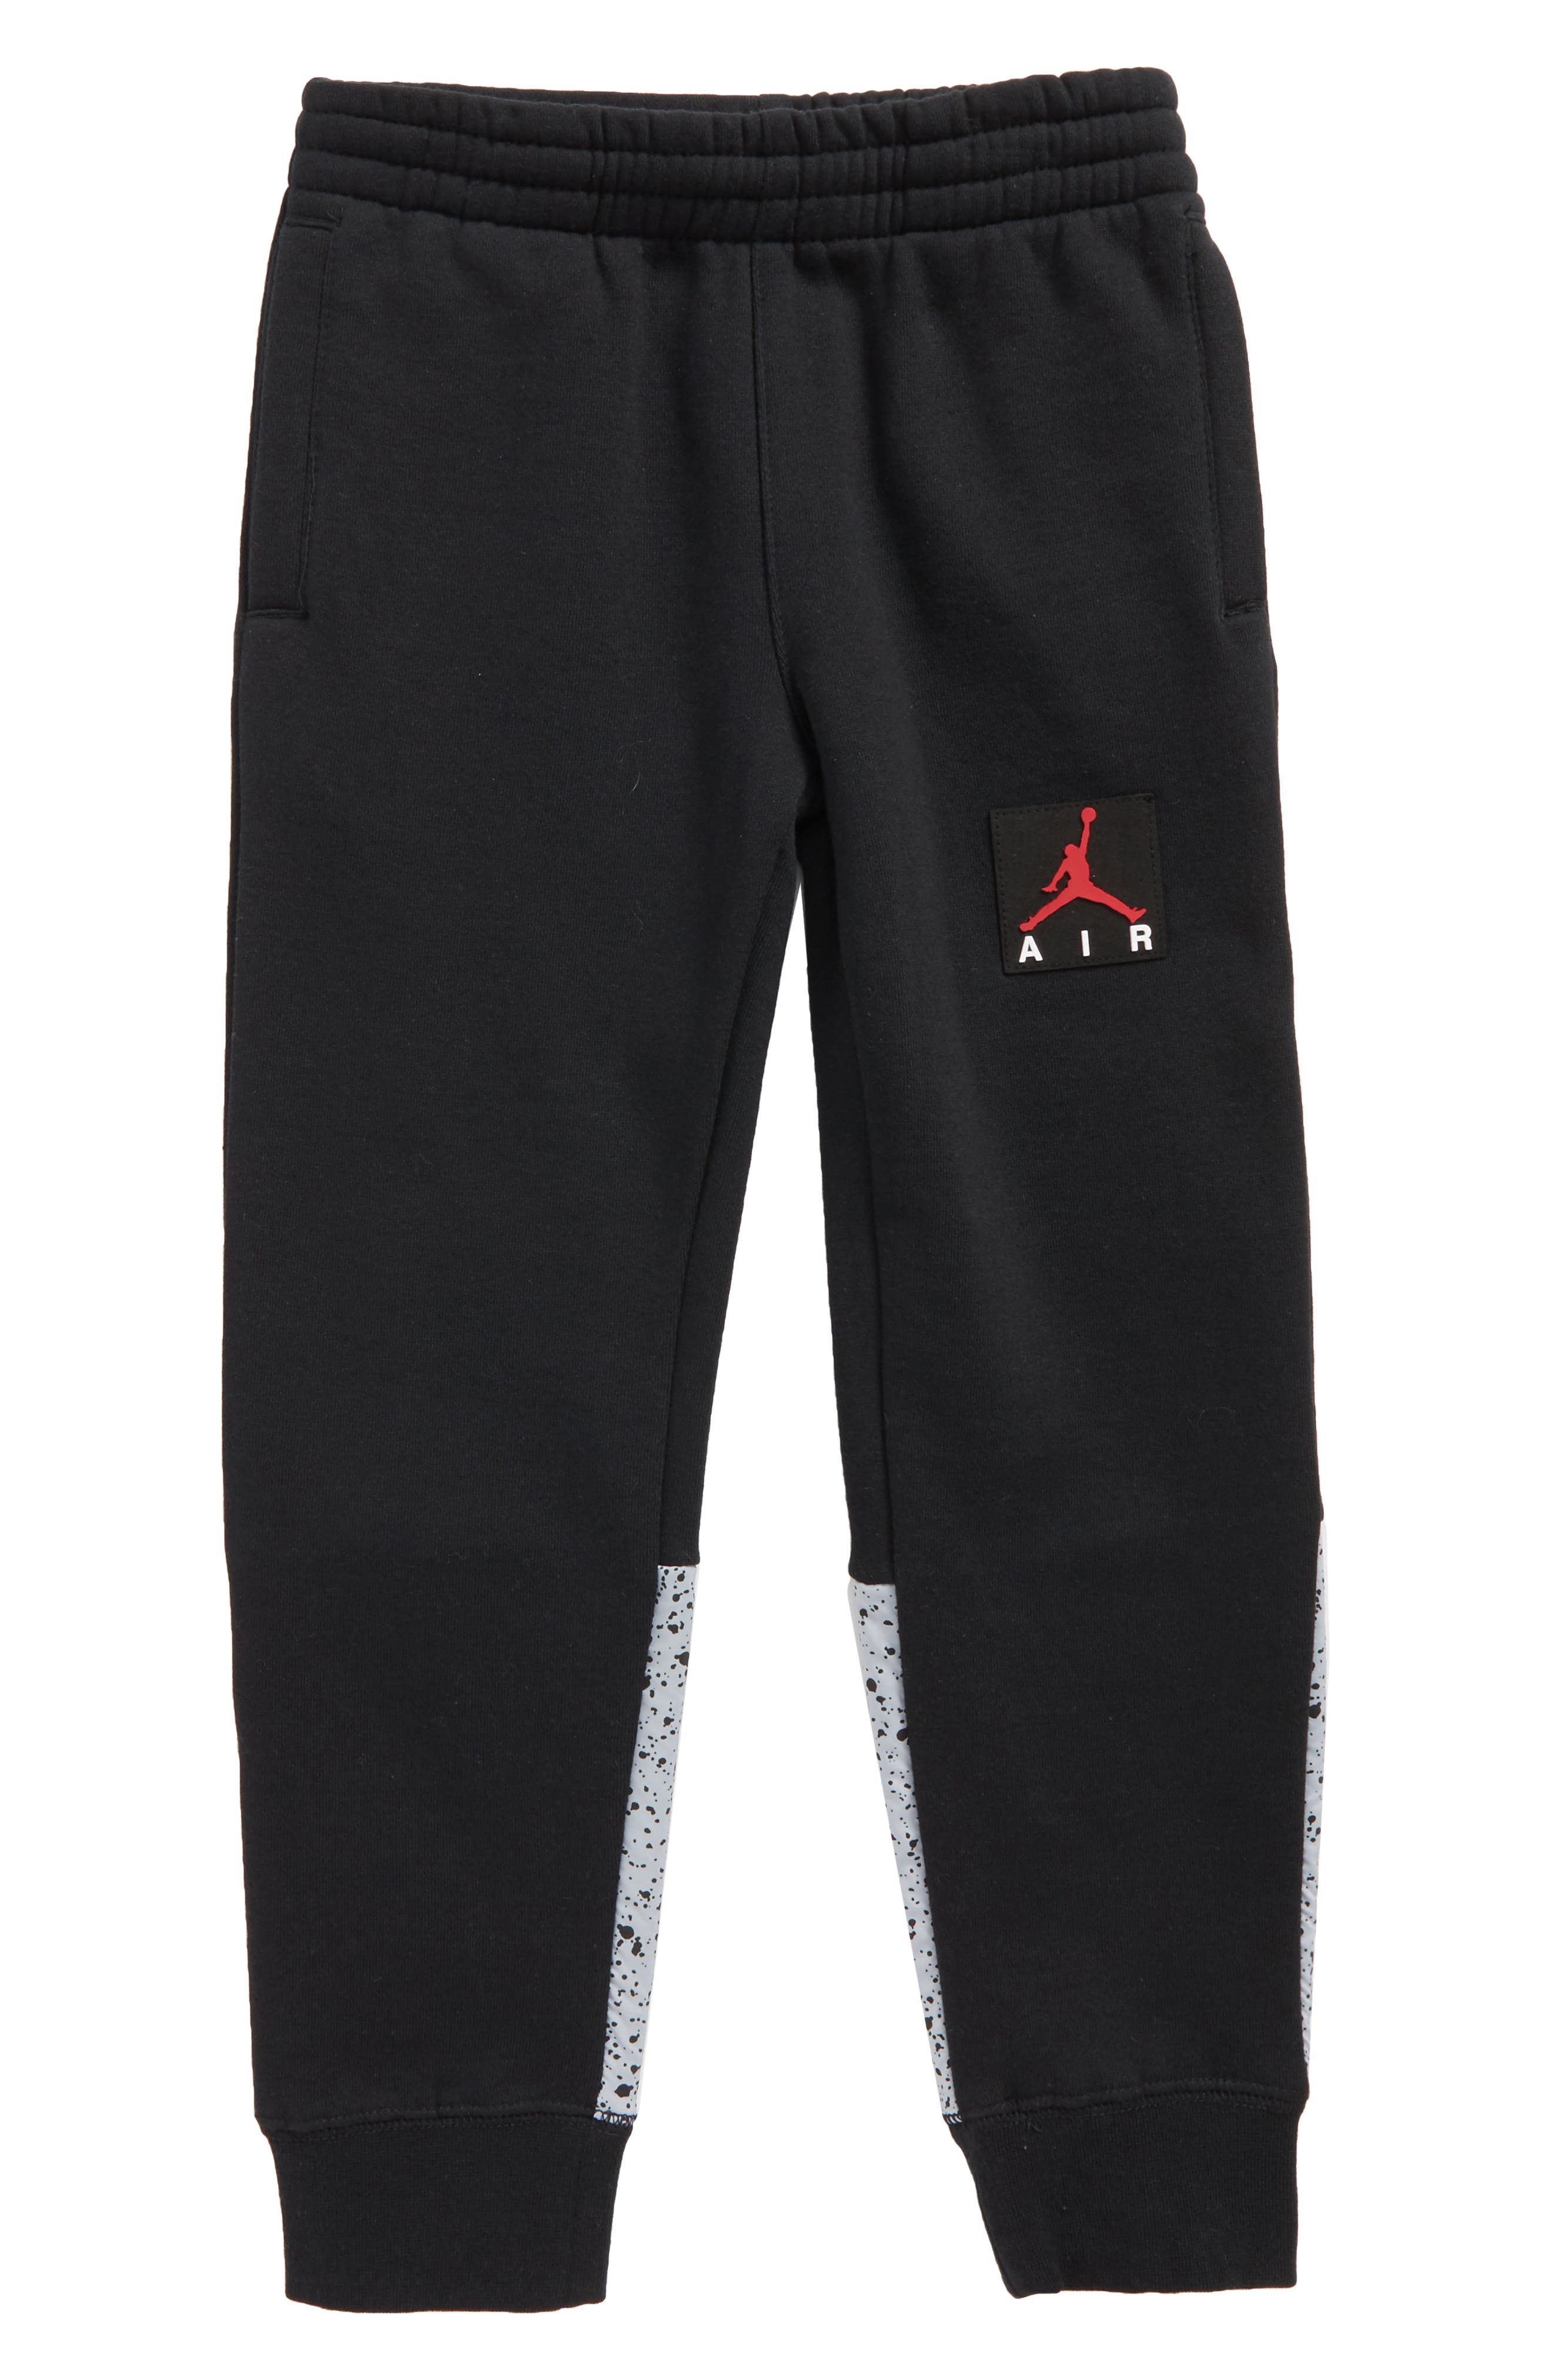 Alternate Image 1 Selected - Jordan Flight Sweatpants (Toddler Boys & Little Boys)